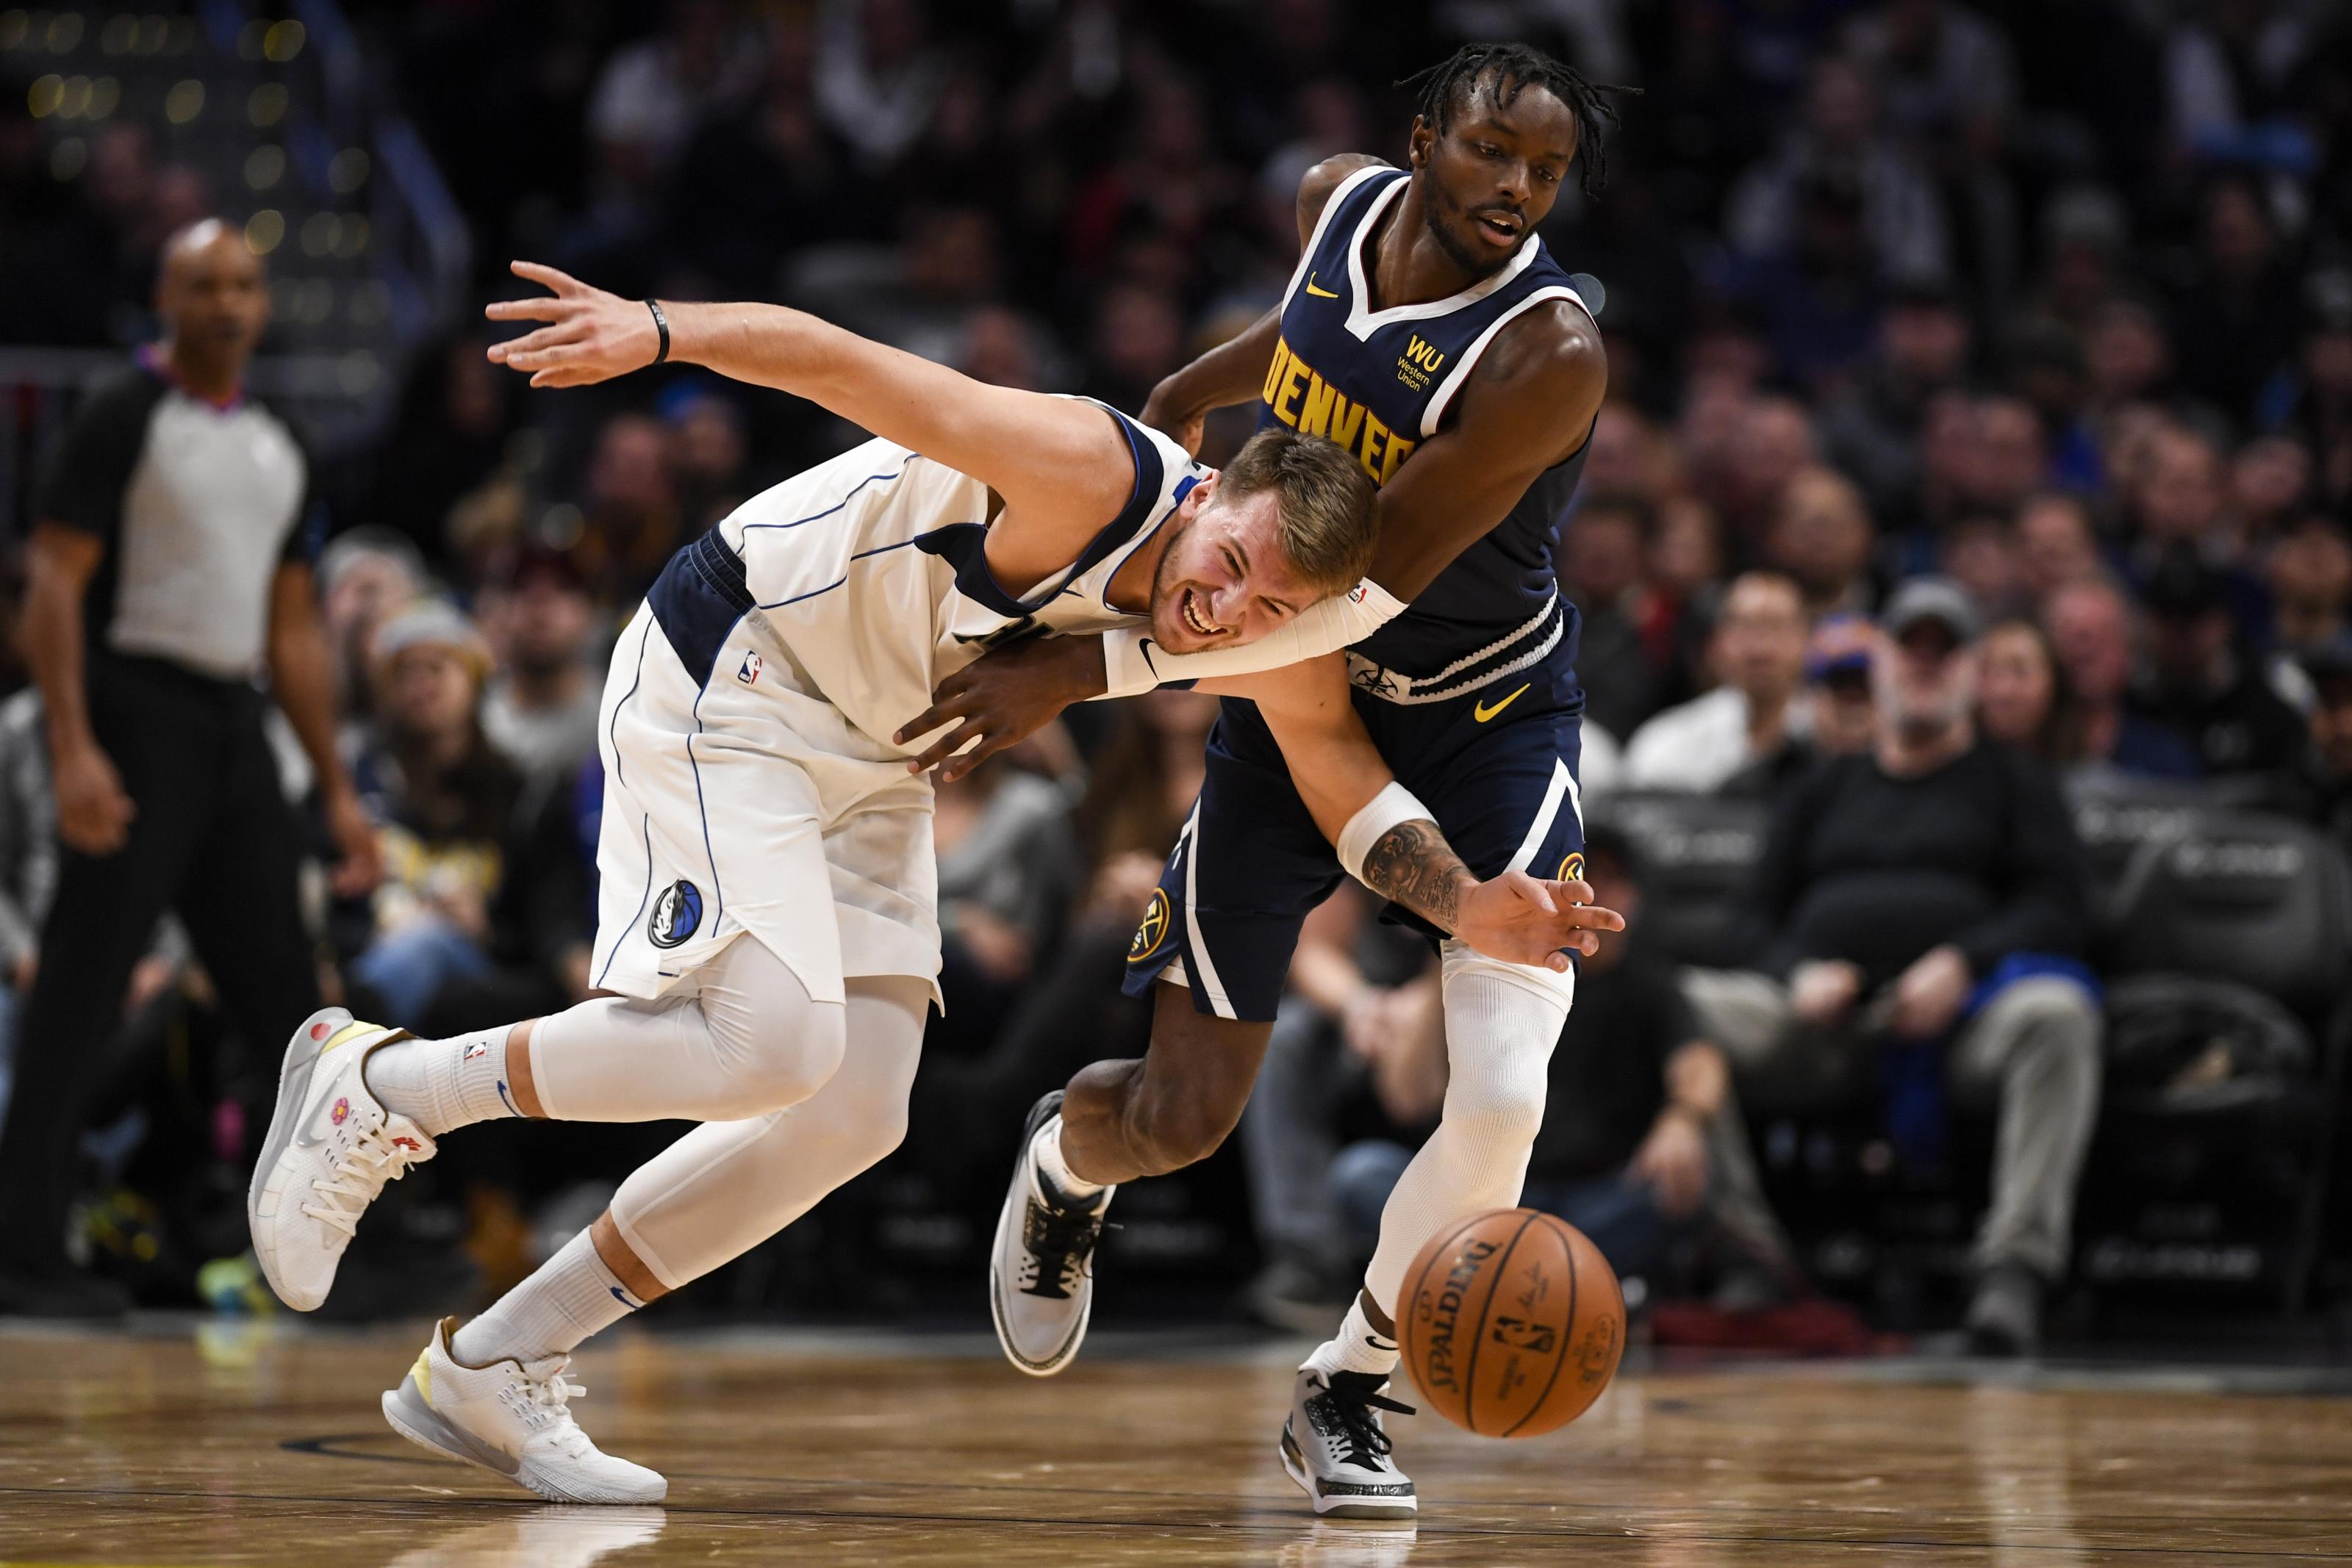 A Denver Nuggets vs. Mavericks Playoff Matchup: Outlook